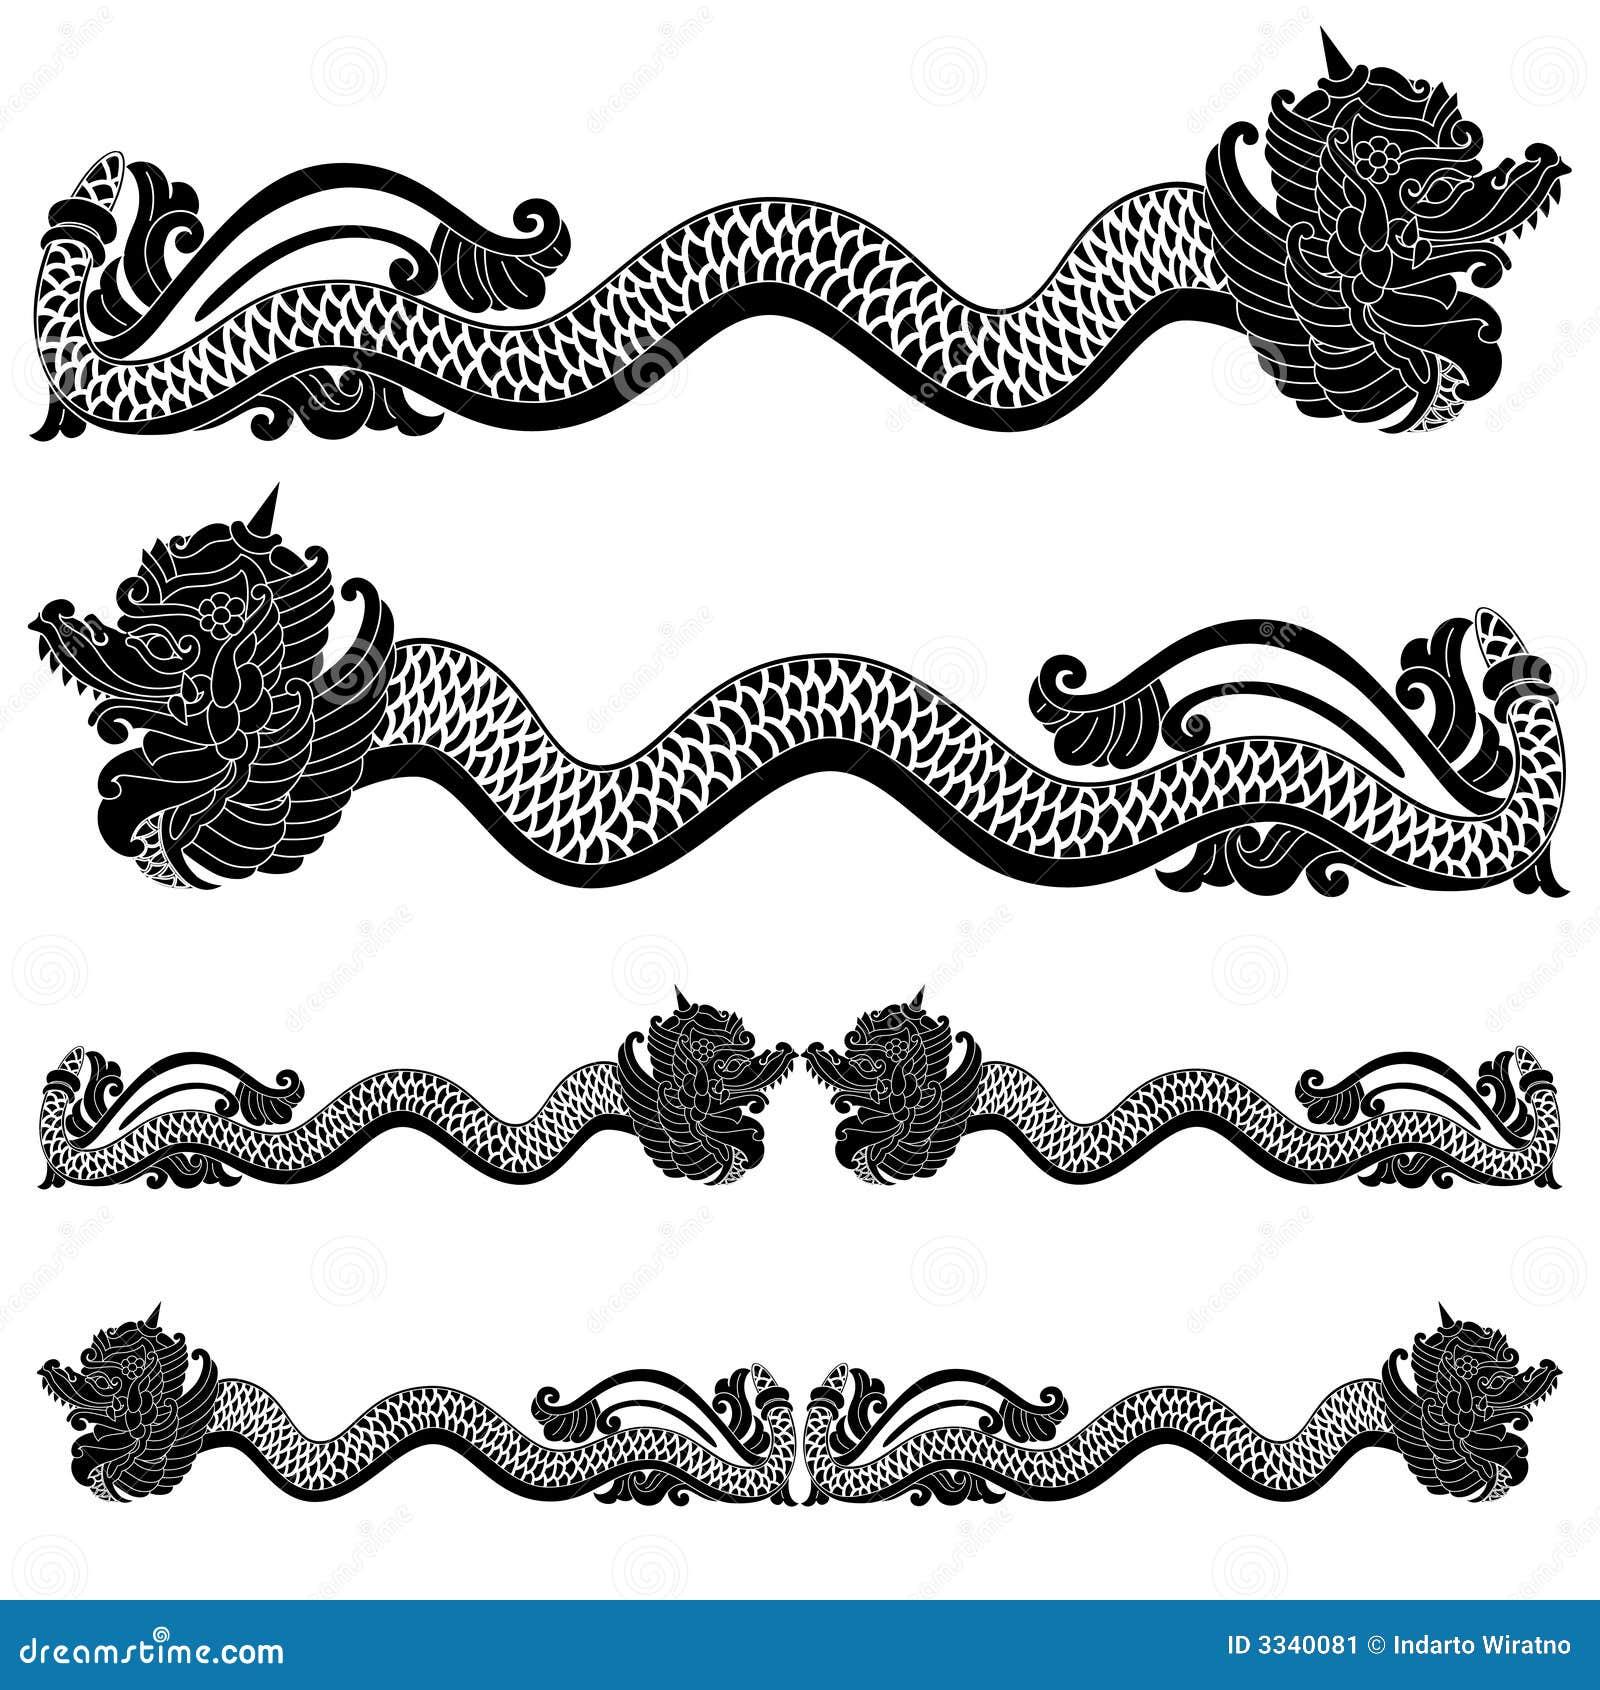 Dragon king stock illustration. Illustration of frame - 3340081